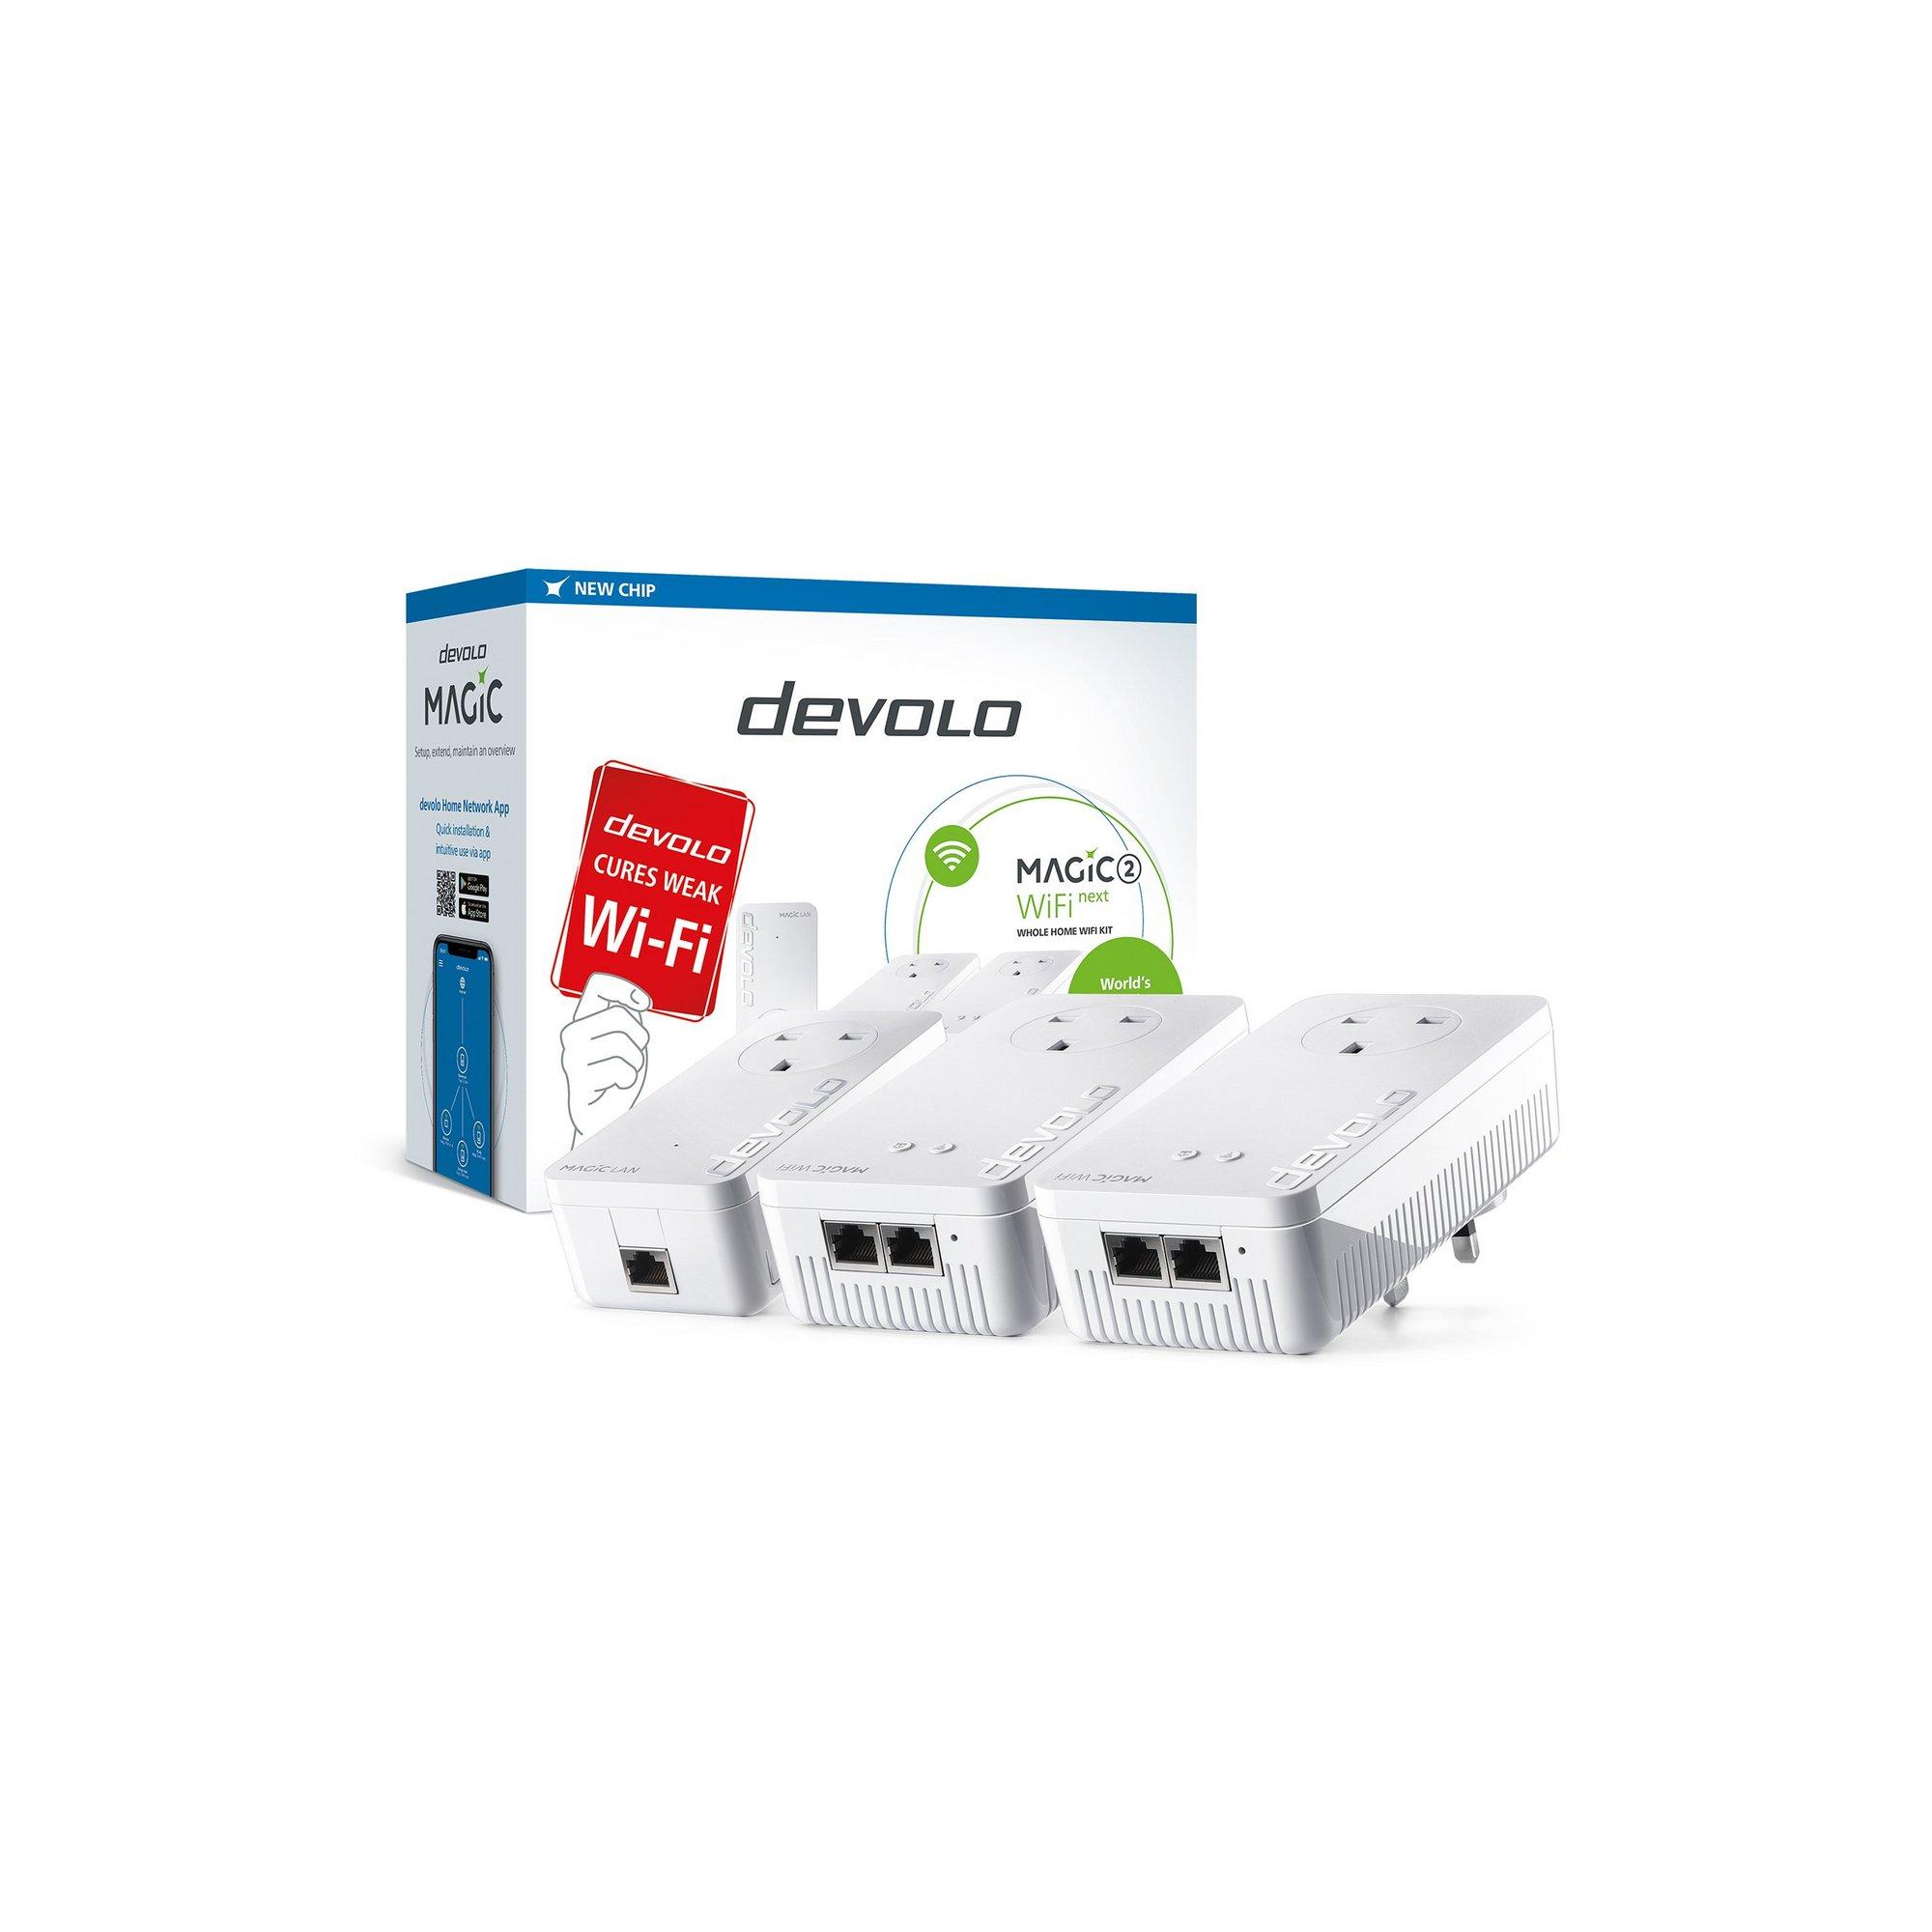 Image of Devolo Magic 2 2400 WiFi NEXT Whole Home WiFi Kit